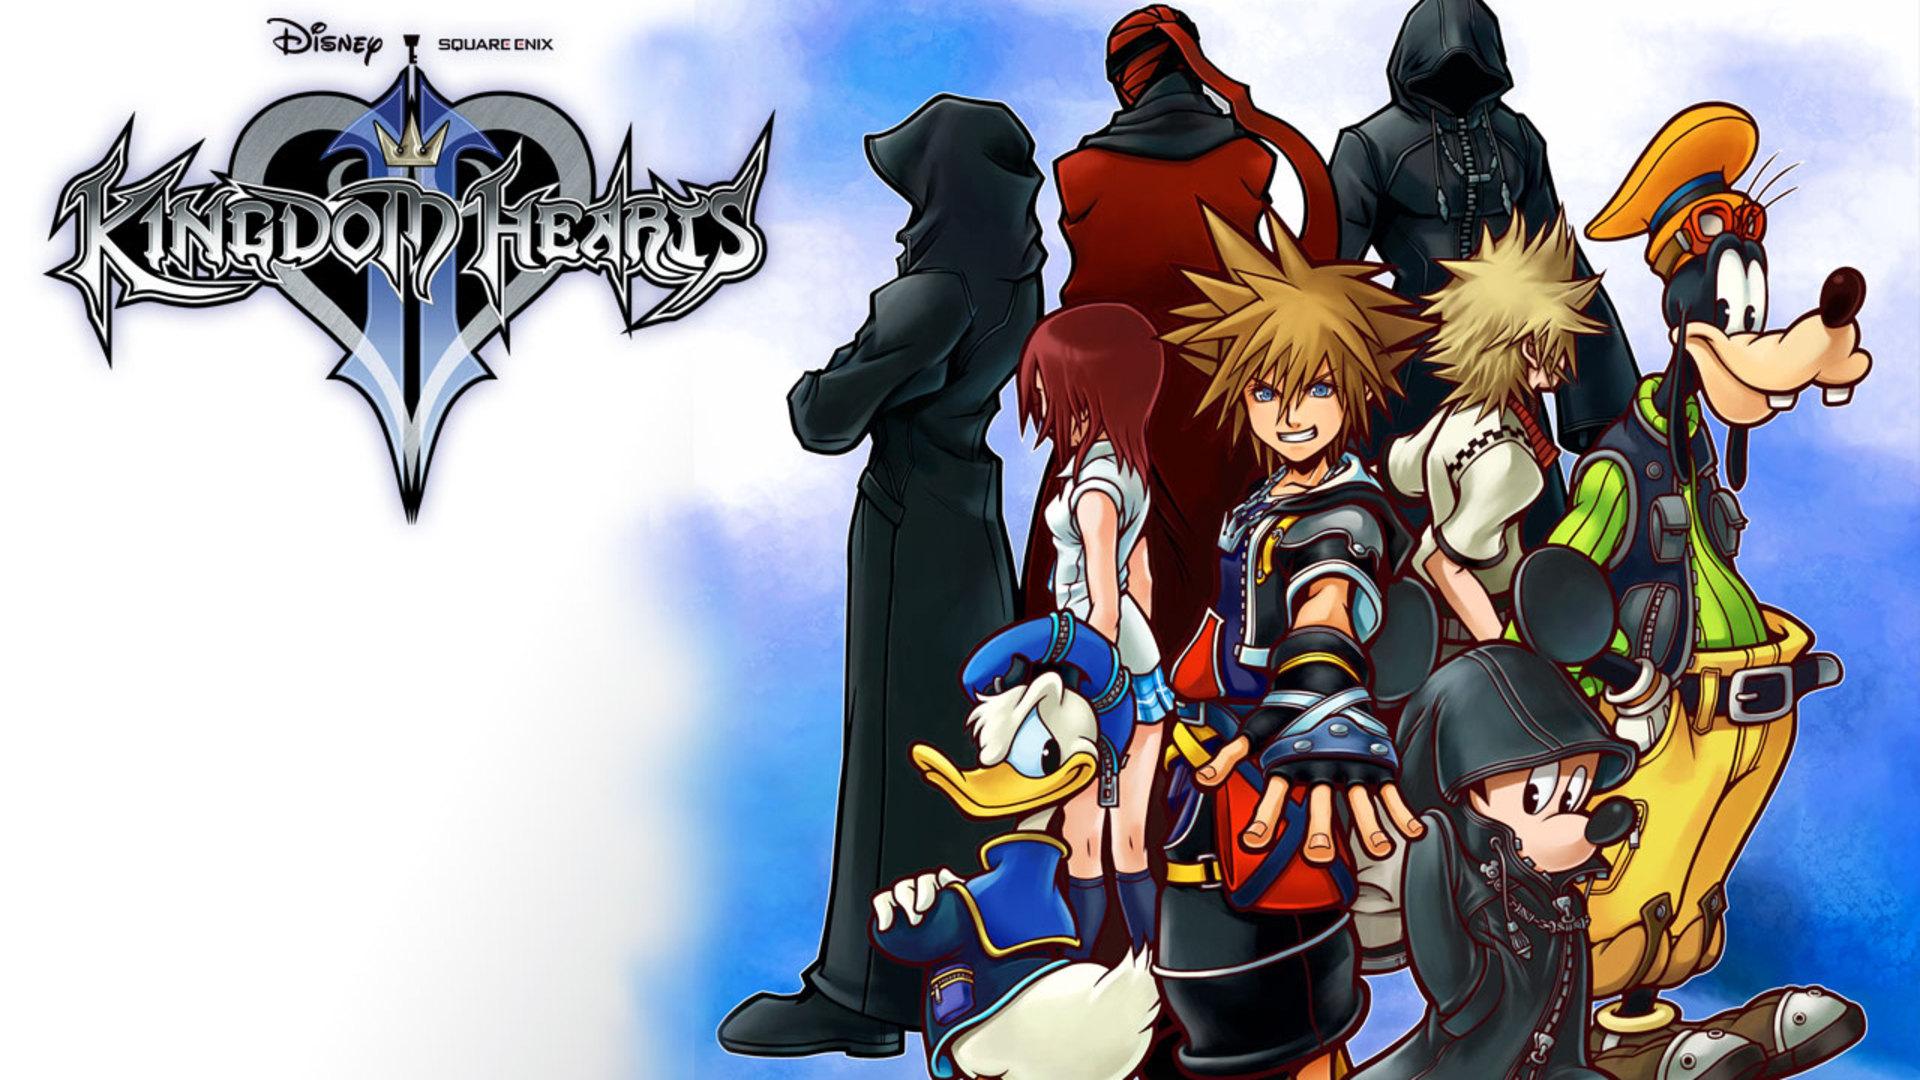 Video Game Kingdom Hearts Ii 1920x1080